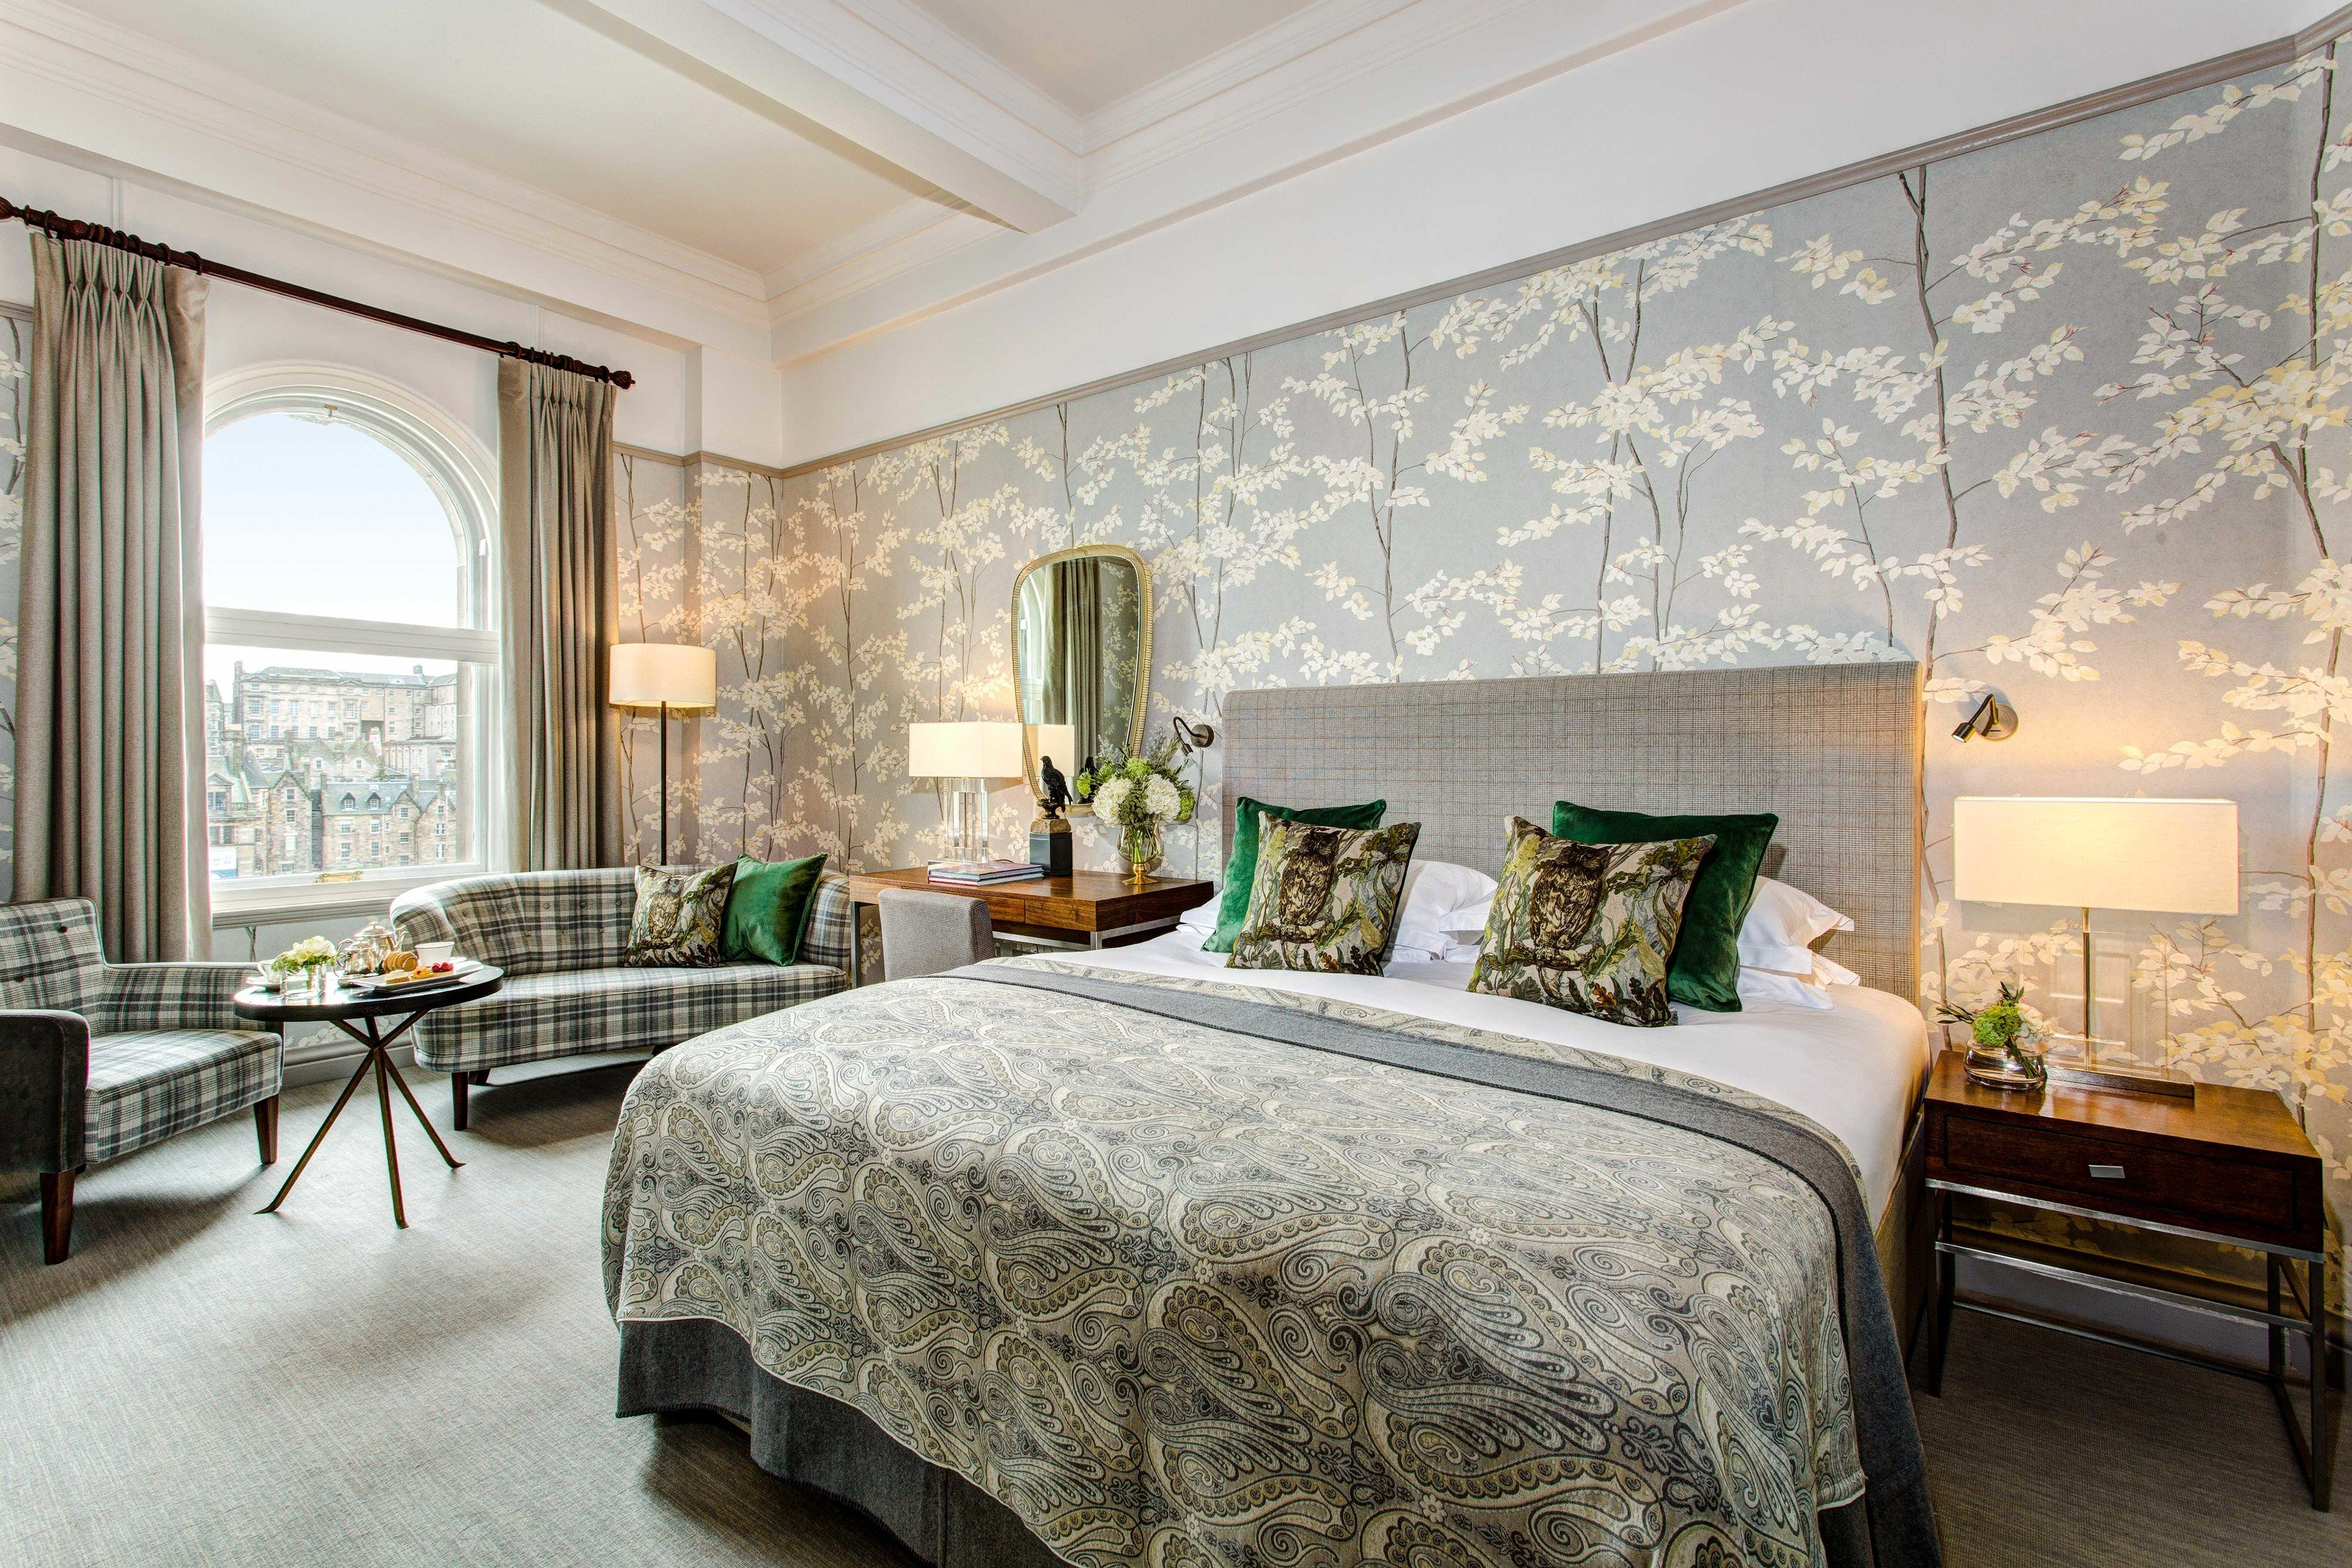 sofa Bedroom Suite bed frame home pillow interior designer window treatment